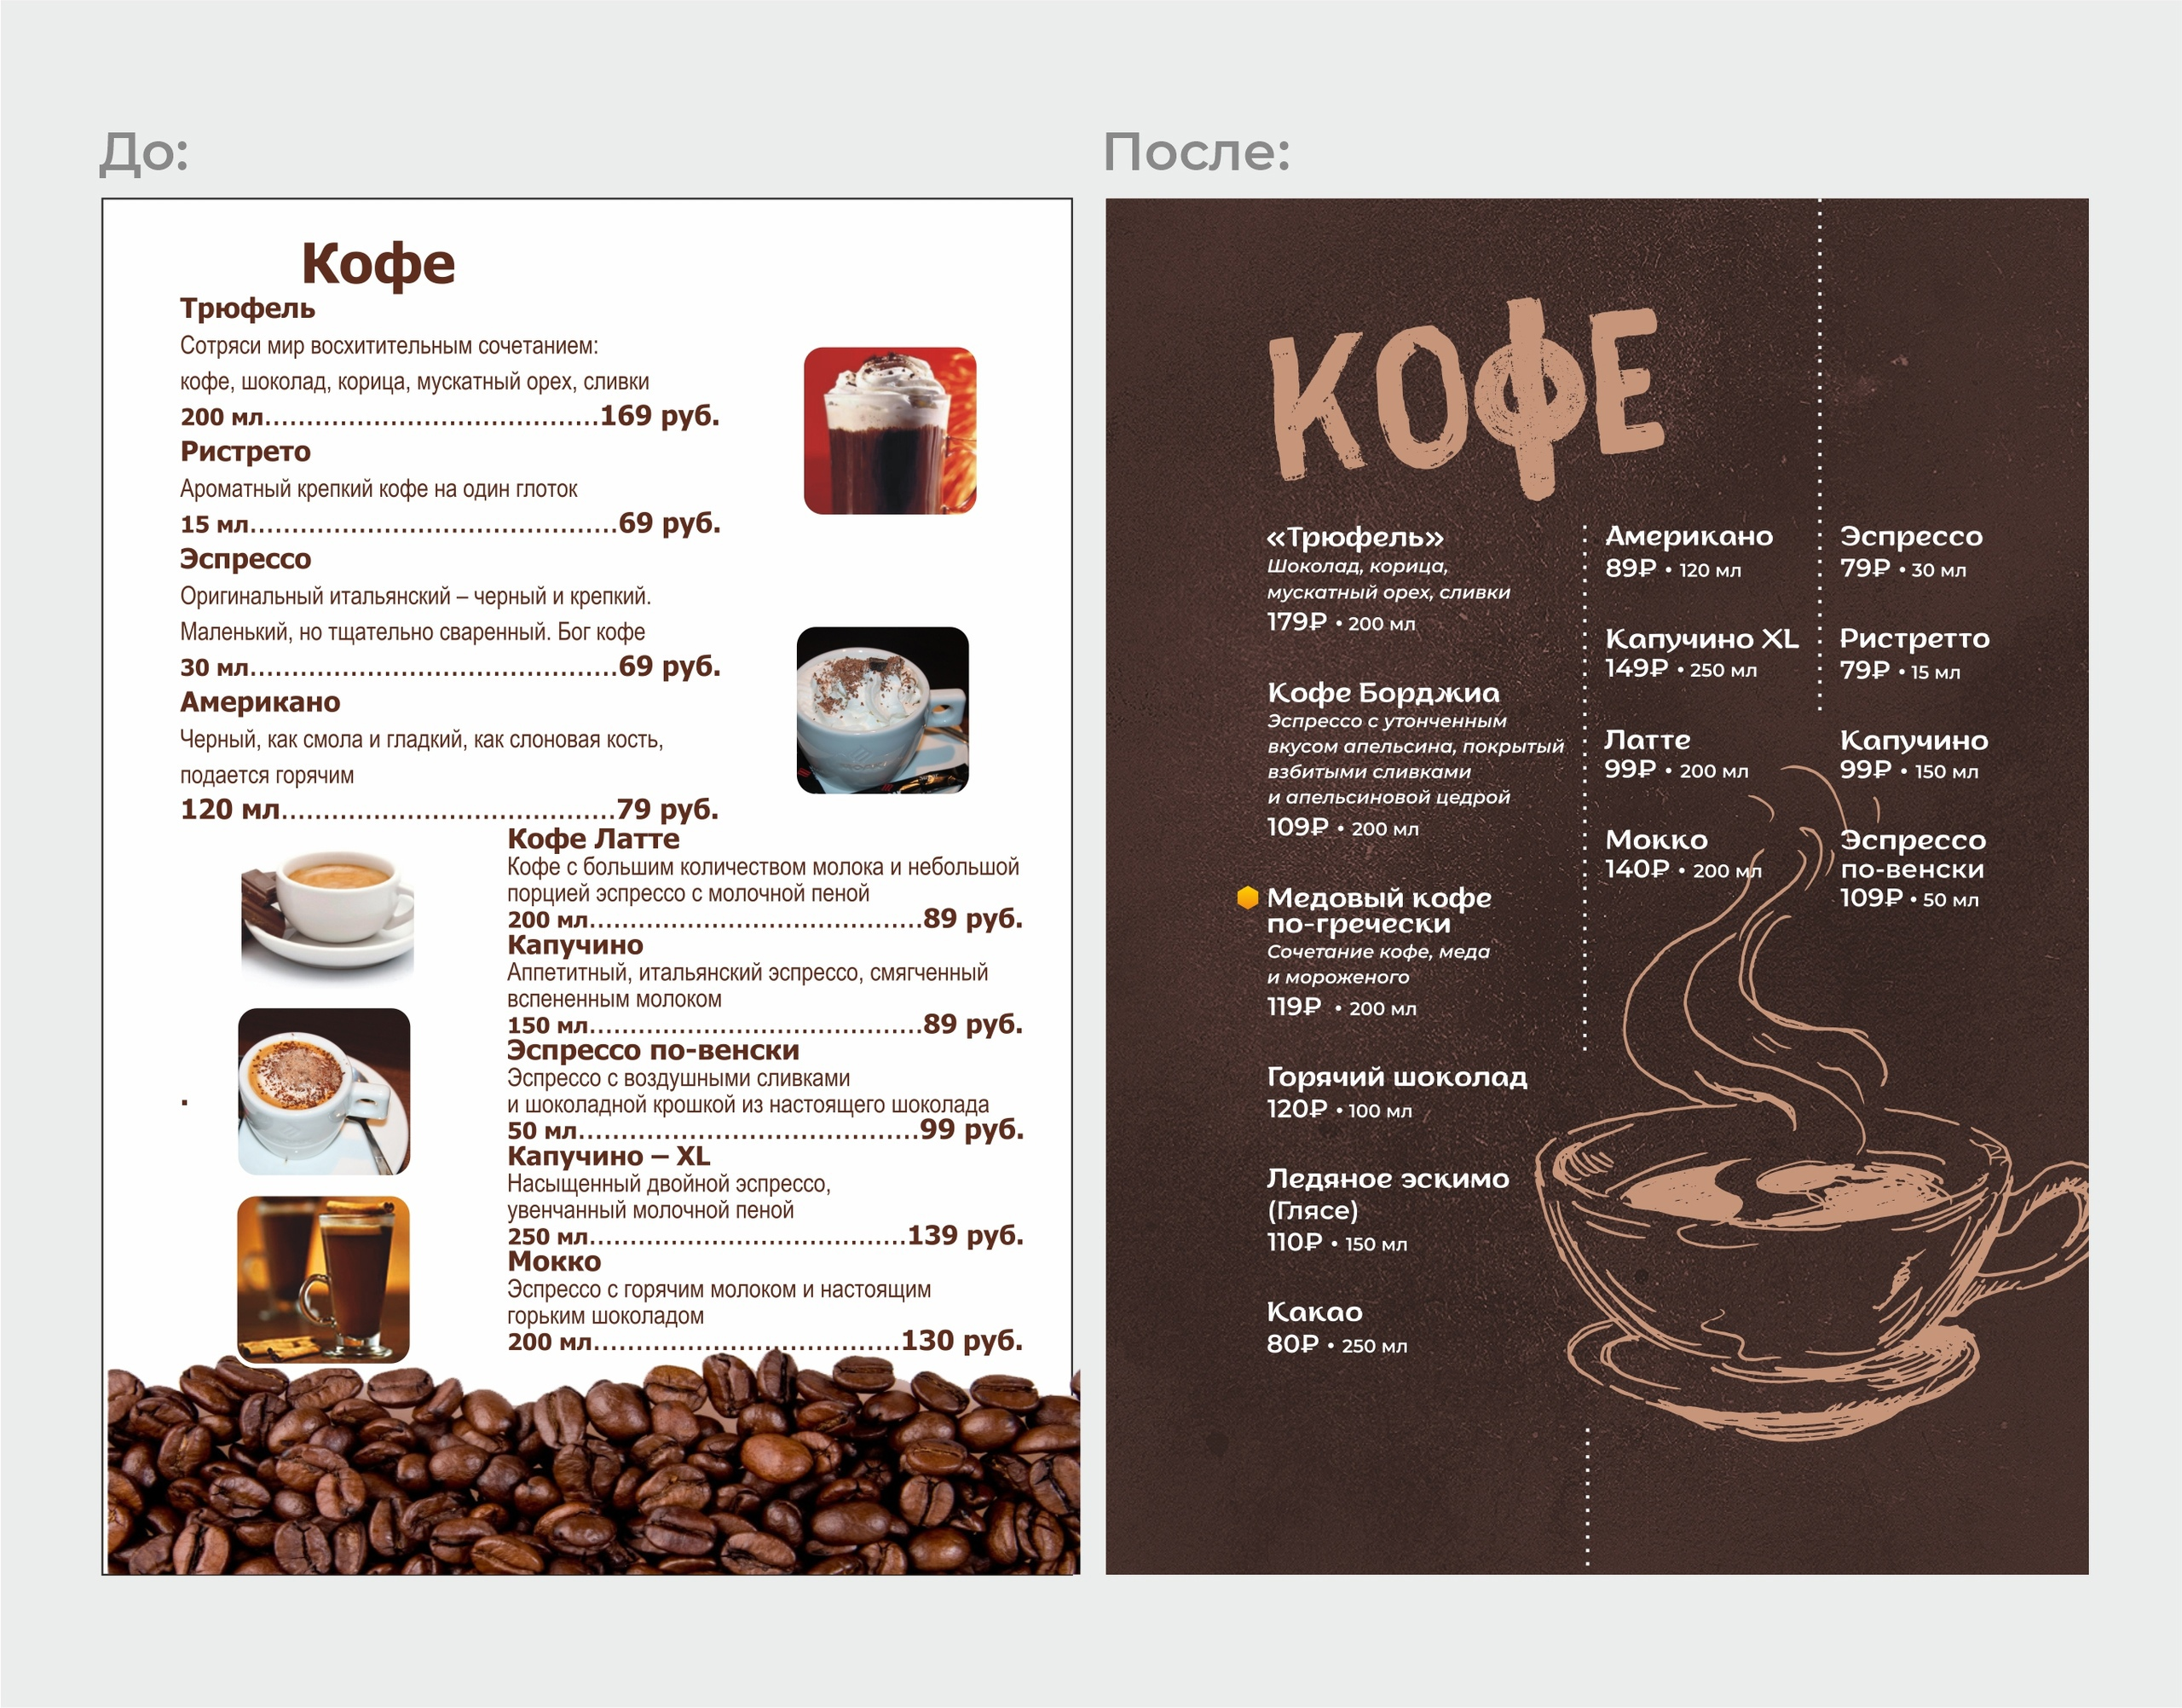 Дизайн меню.